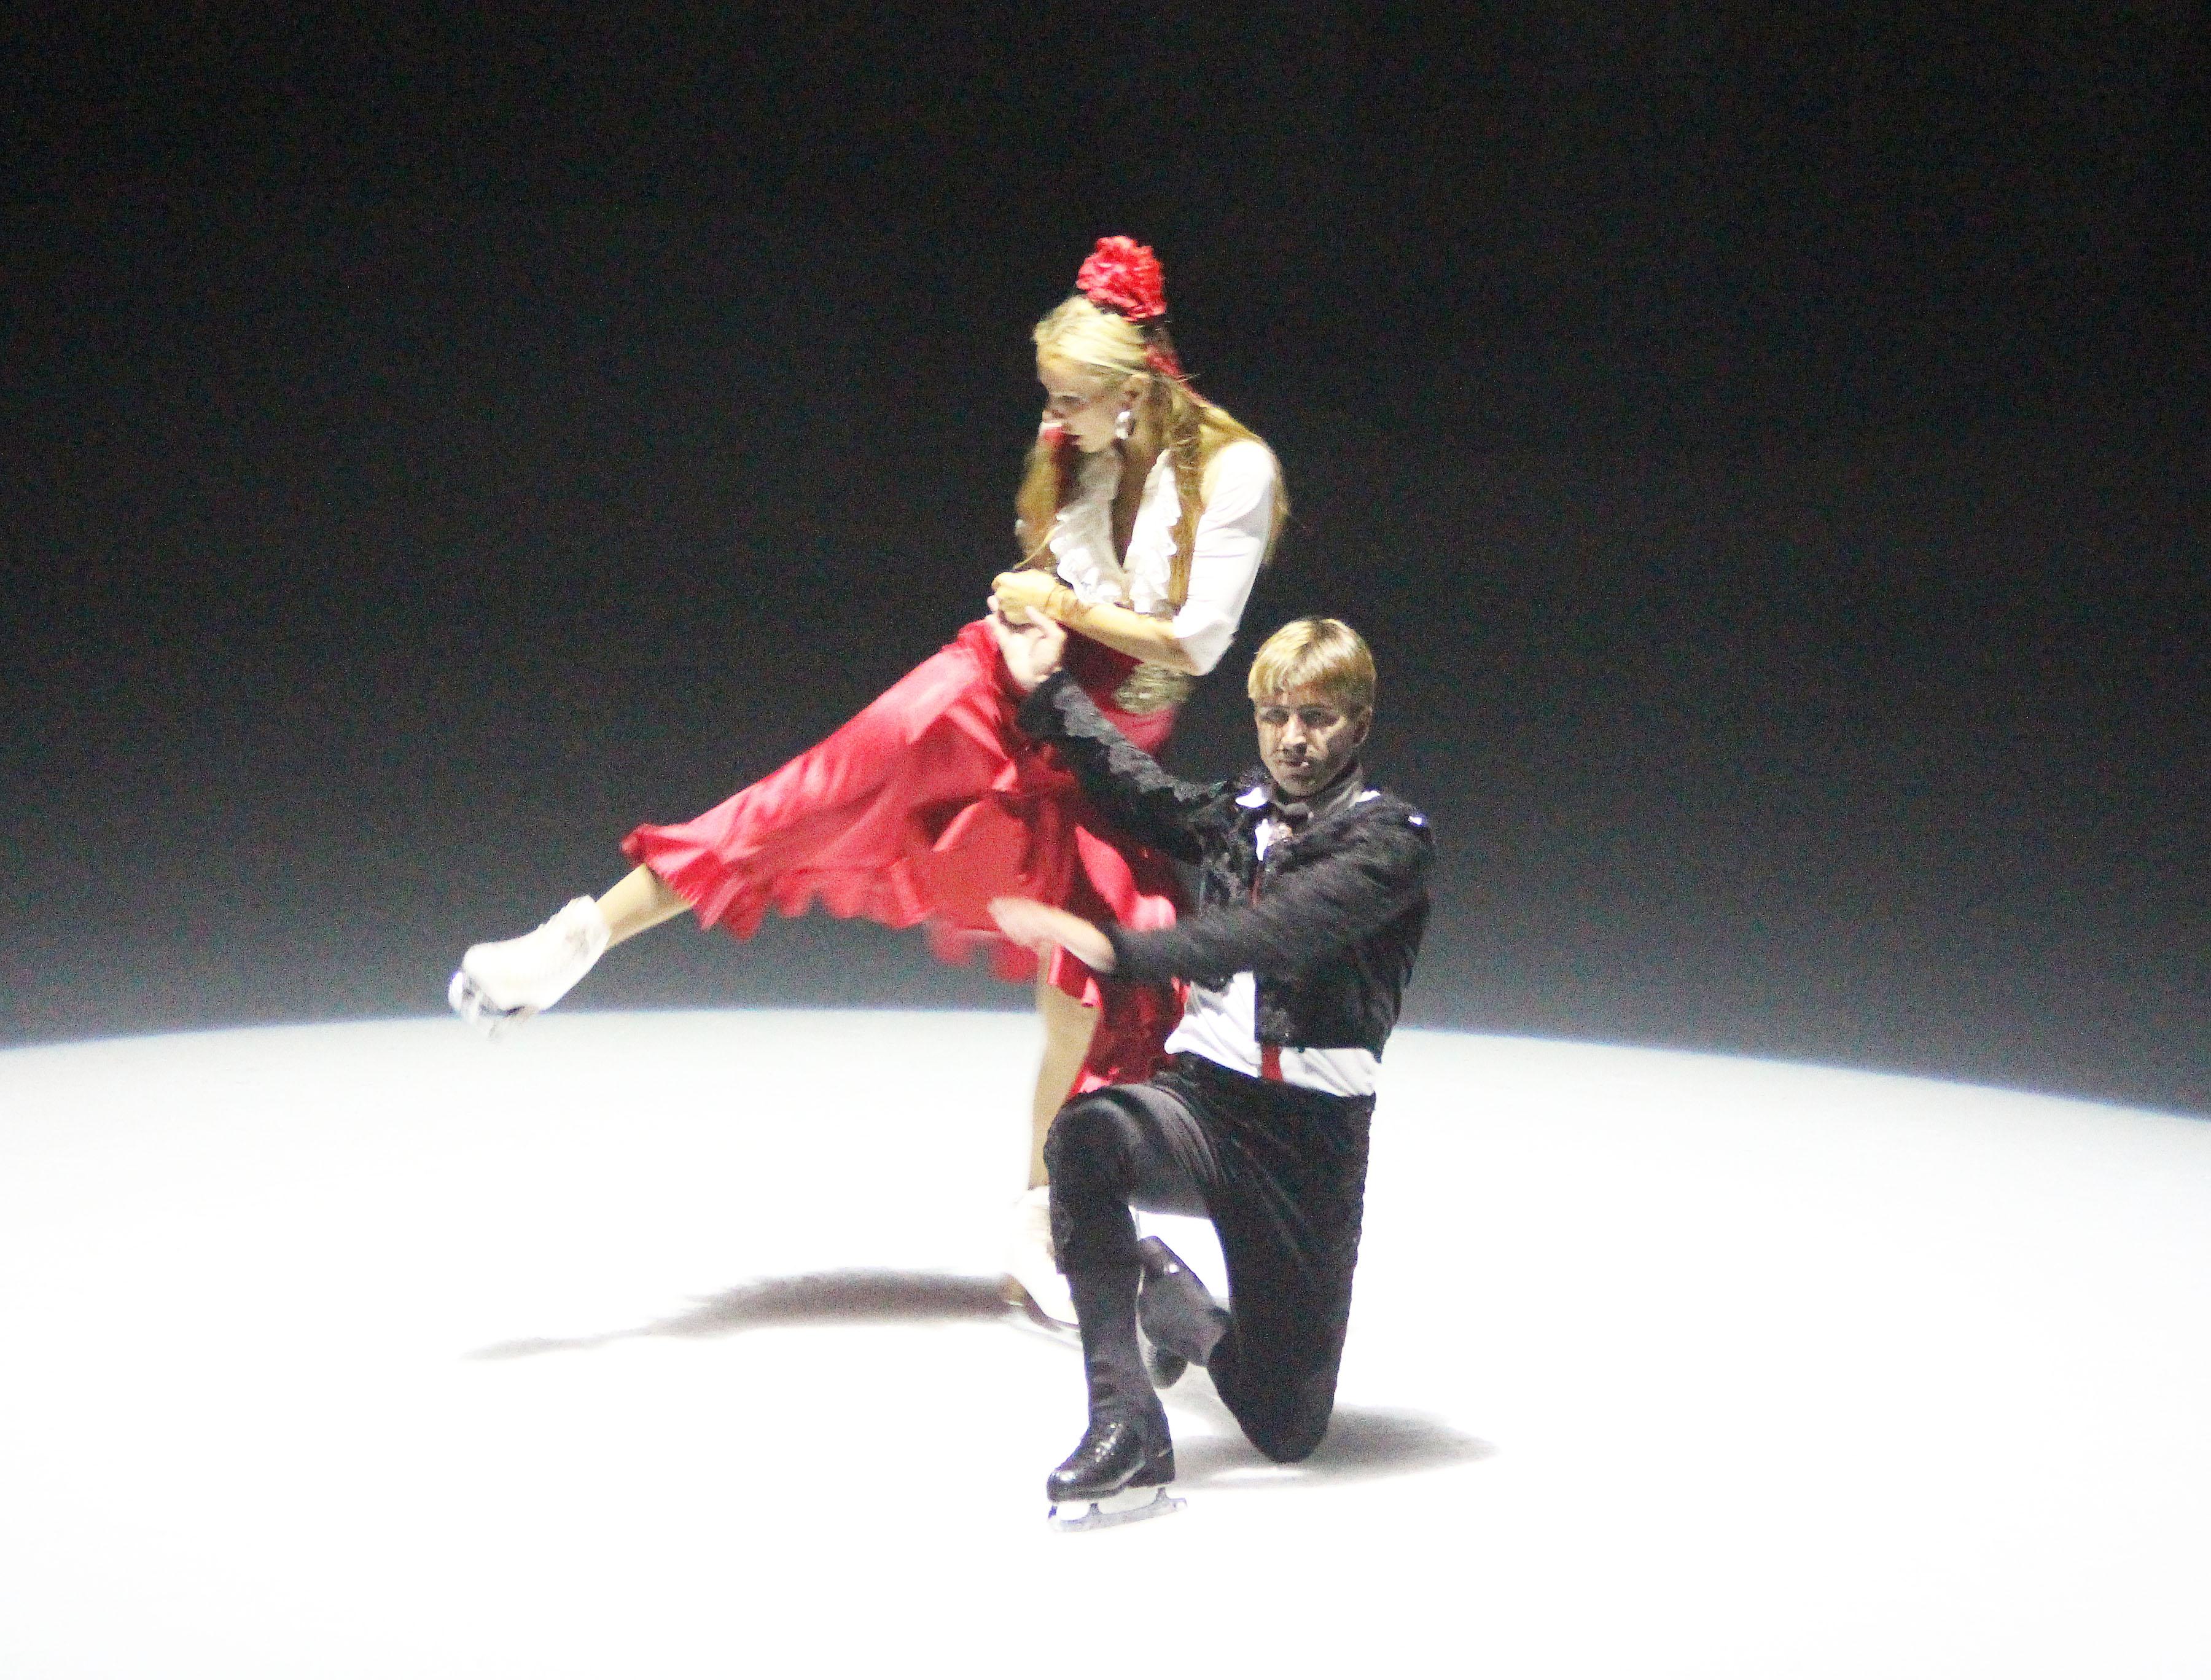 Кармен-2016. Сочи - Страница 10 0_c9518_ee72d7cf_orig